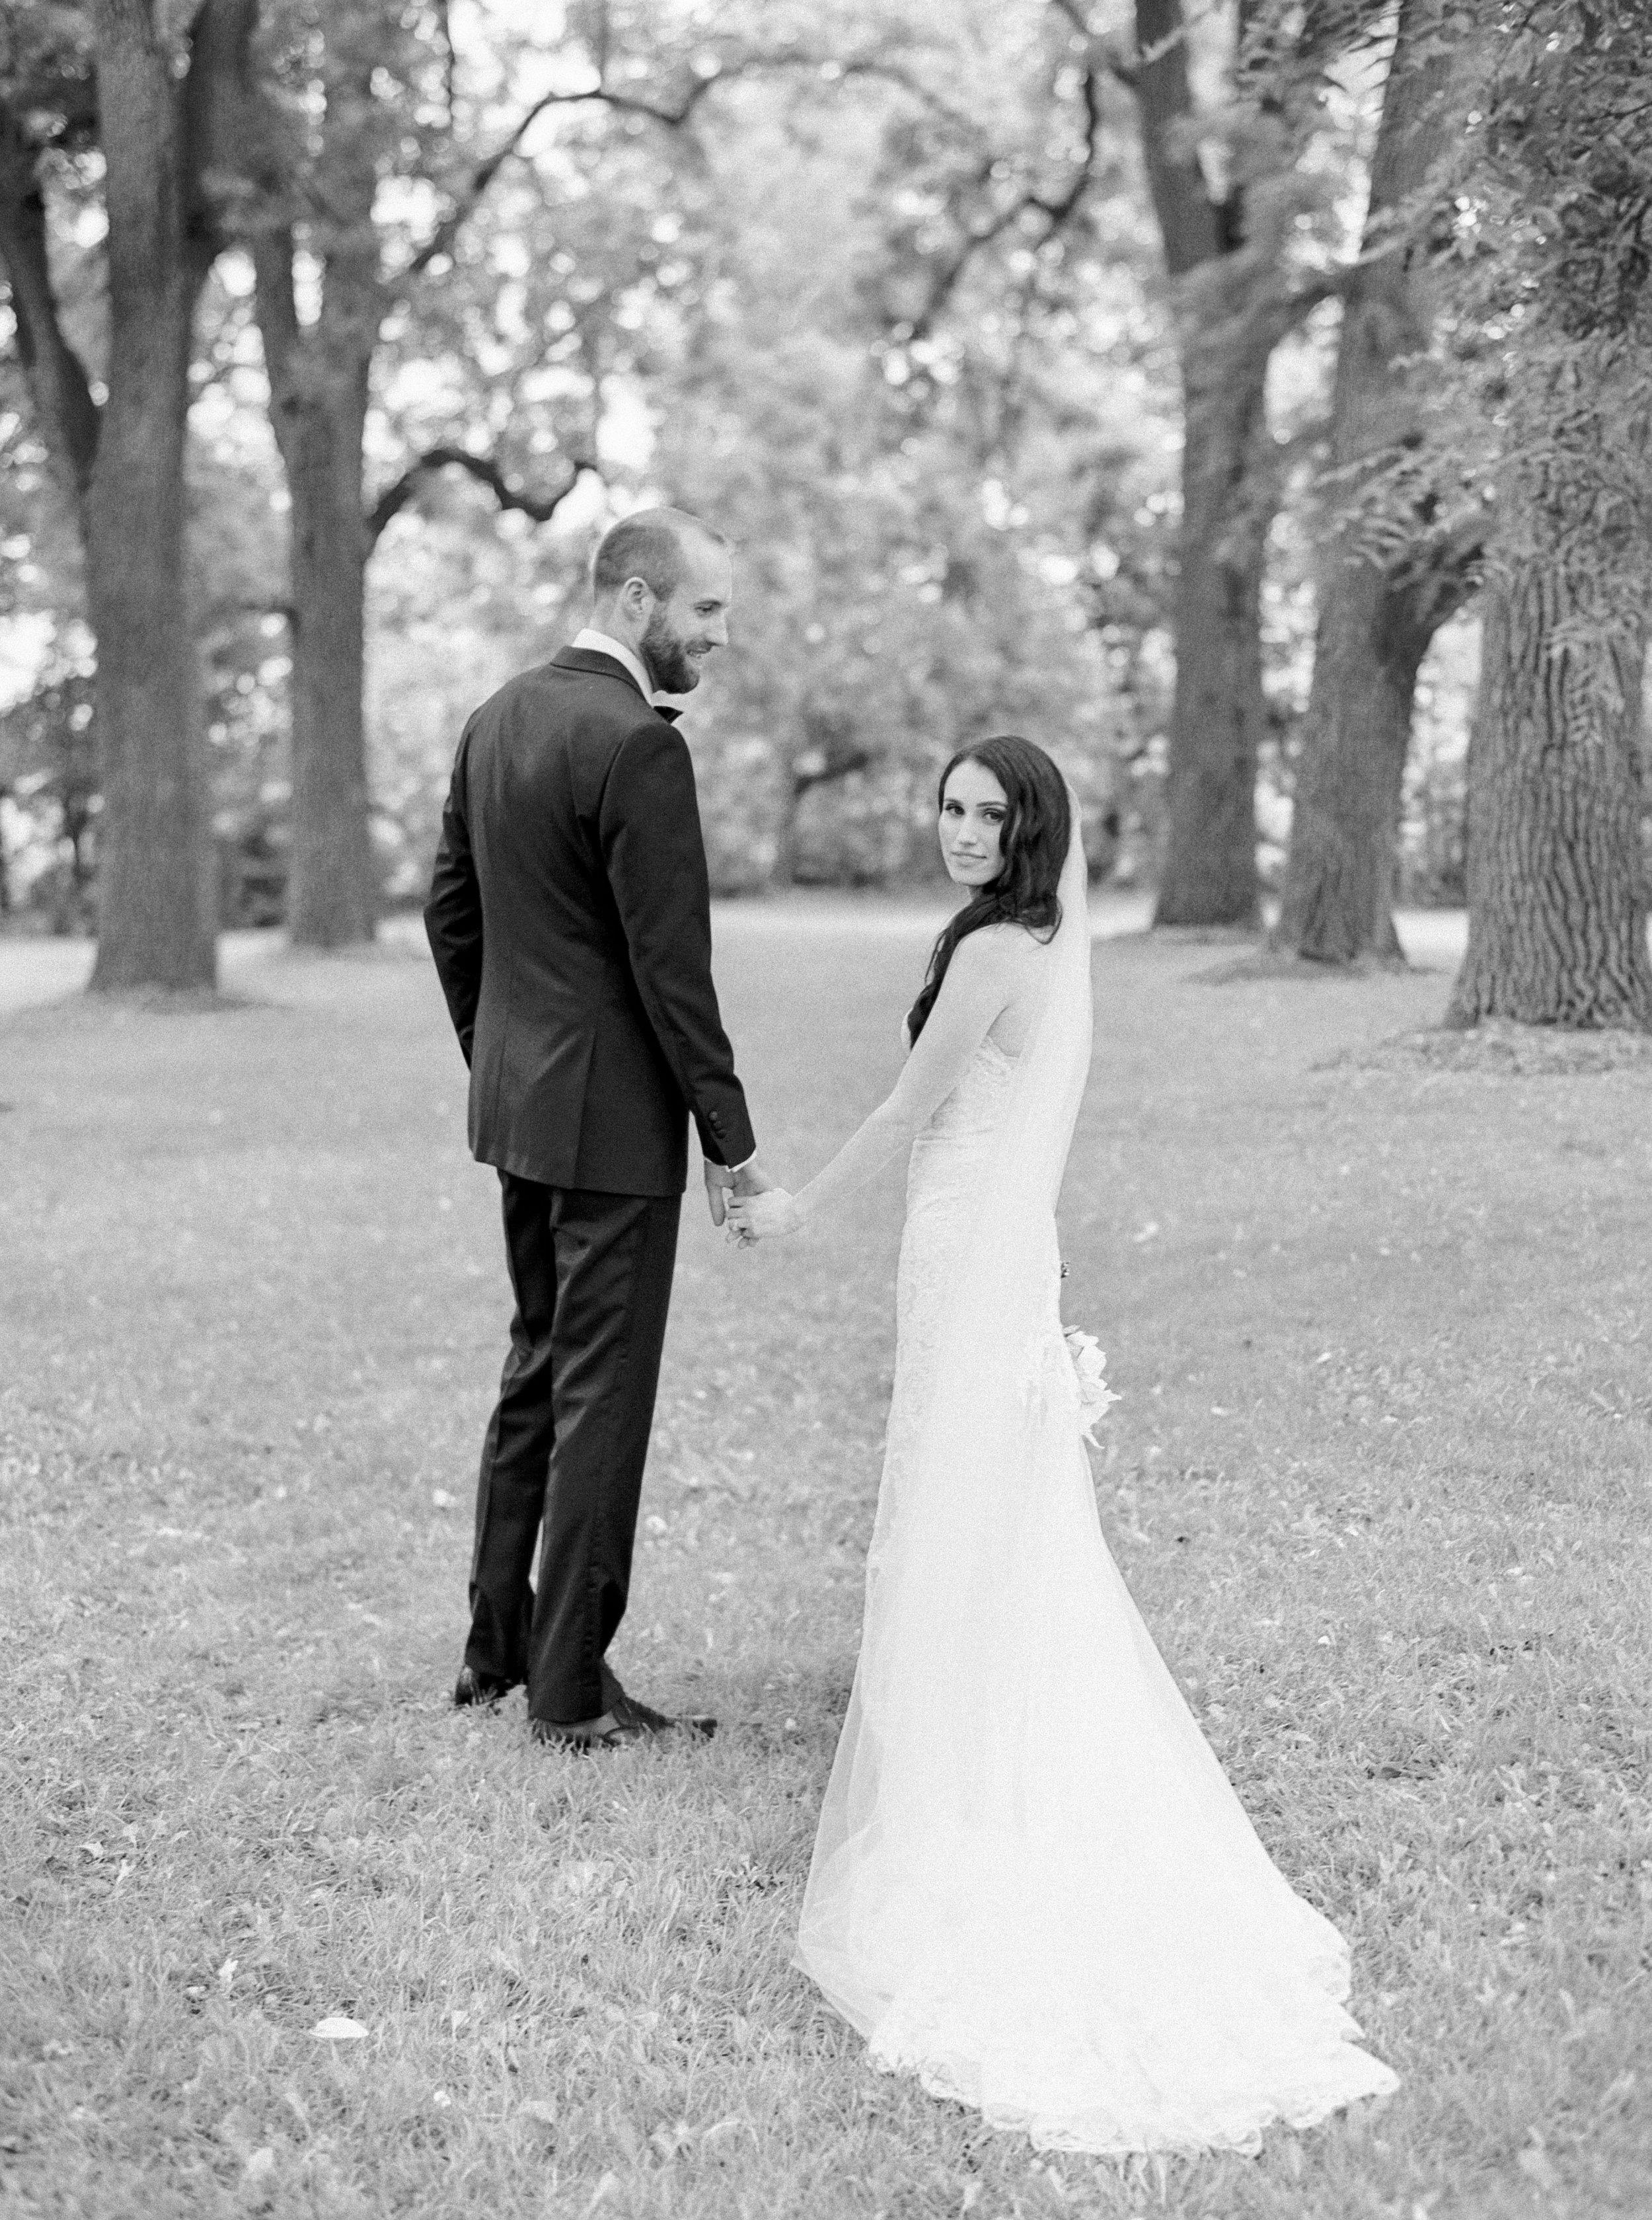 kurtz-wedding-toronto-photographer-langdon-film-richelle-hunter-anna-rob-previews-23.jpg